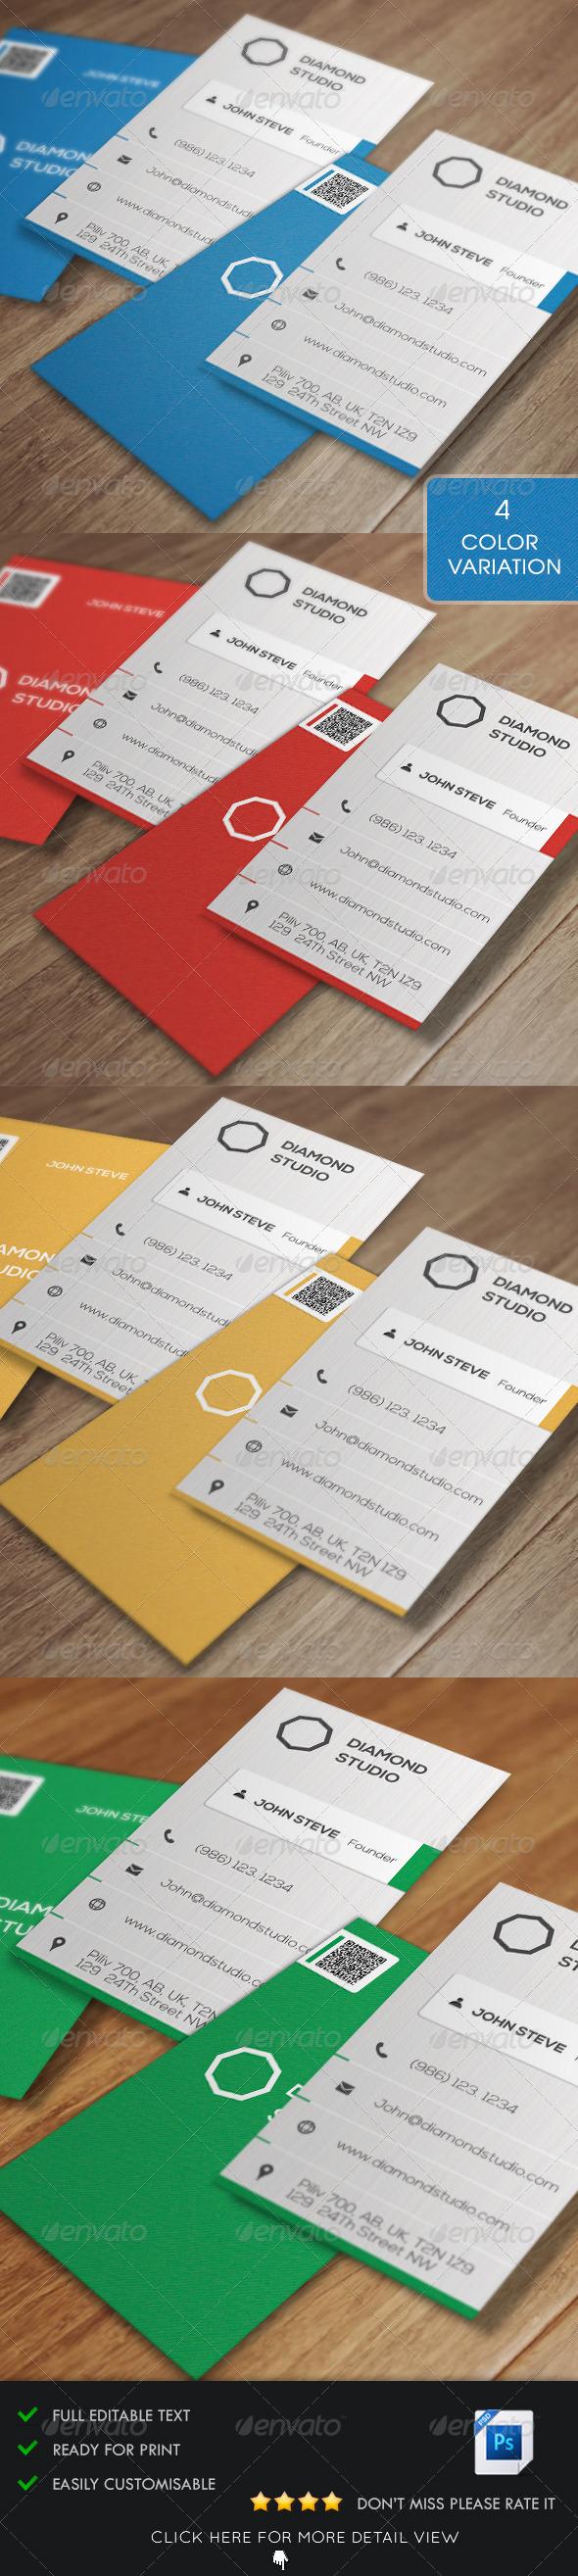 GraphicRiver Corporate Business Card v6 5532320